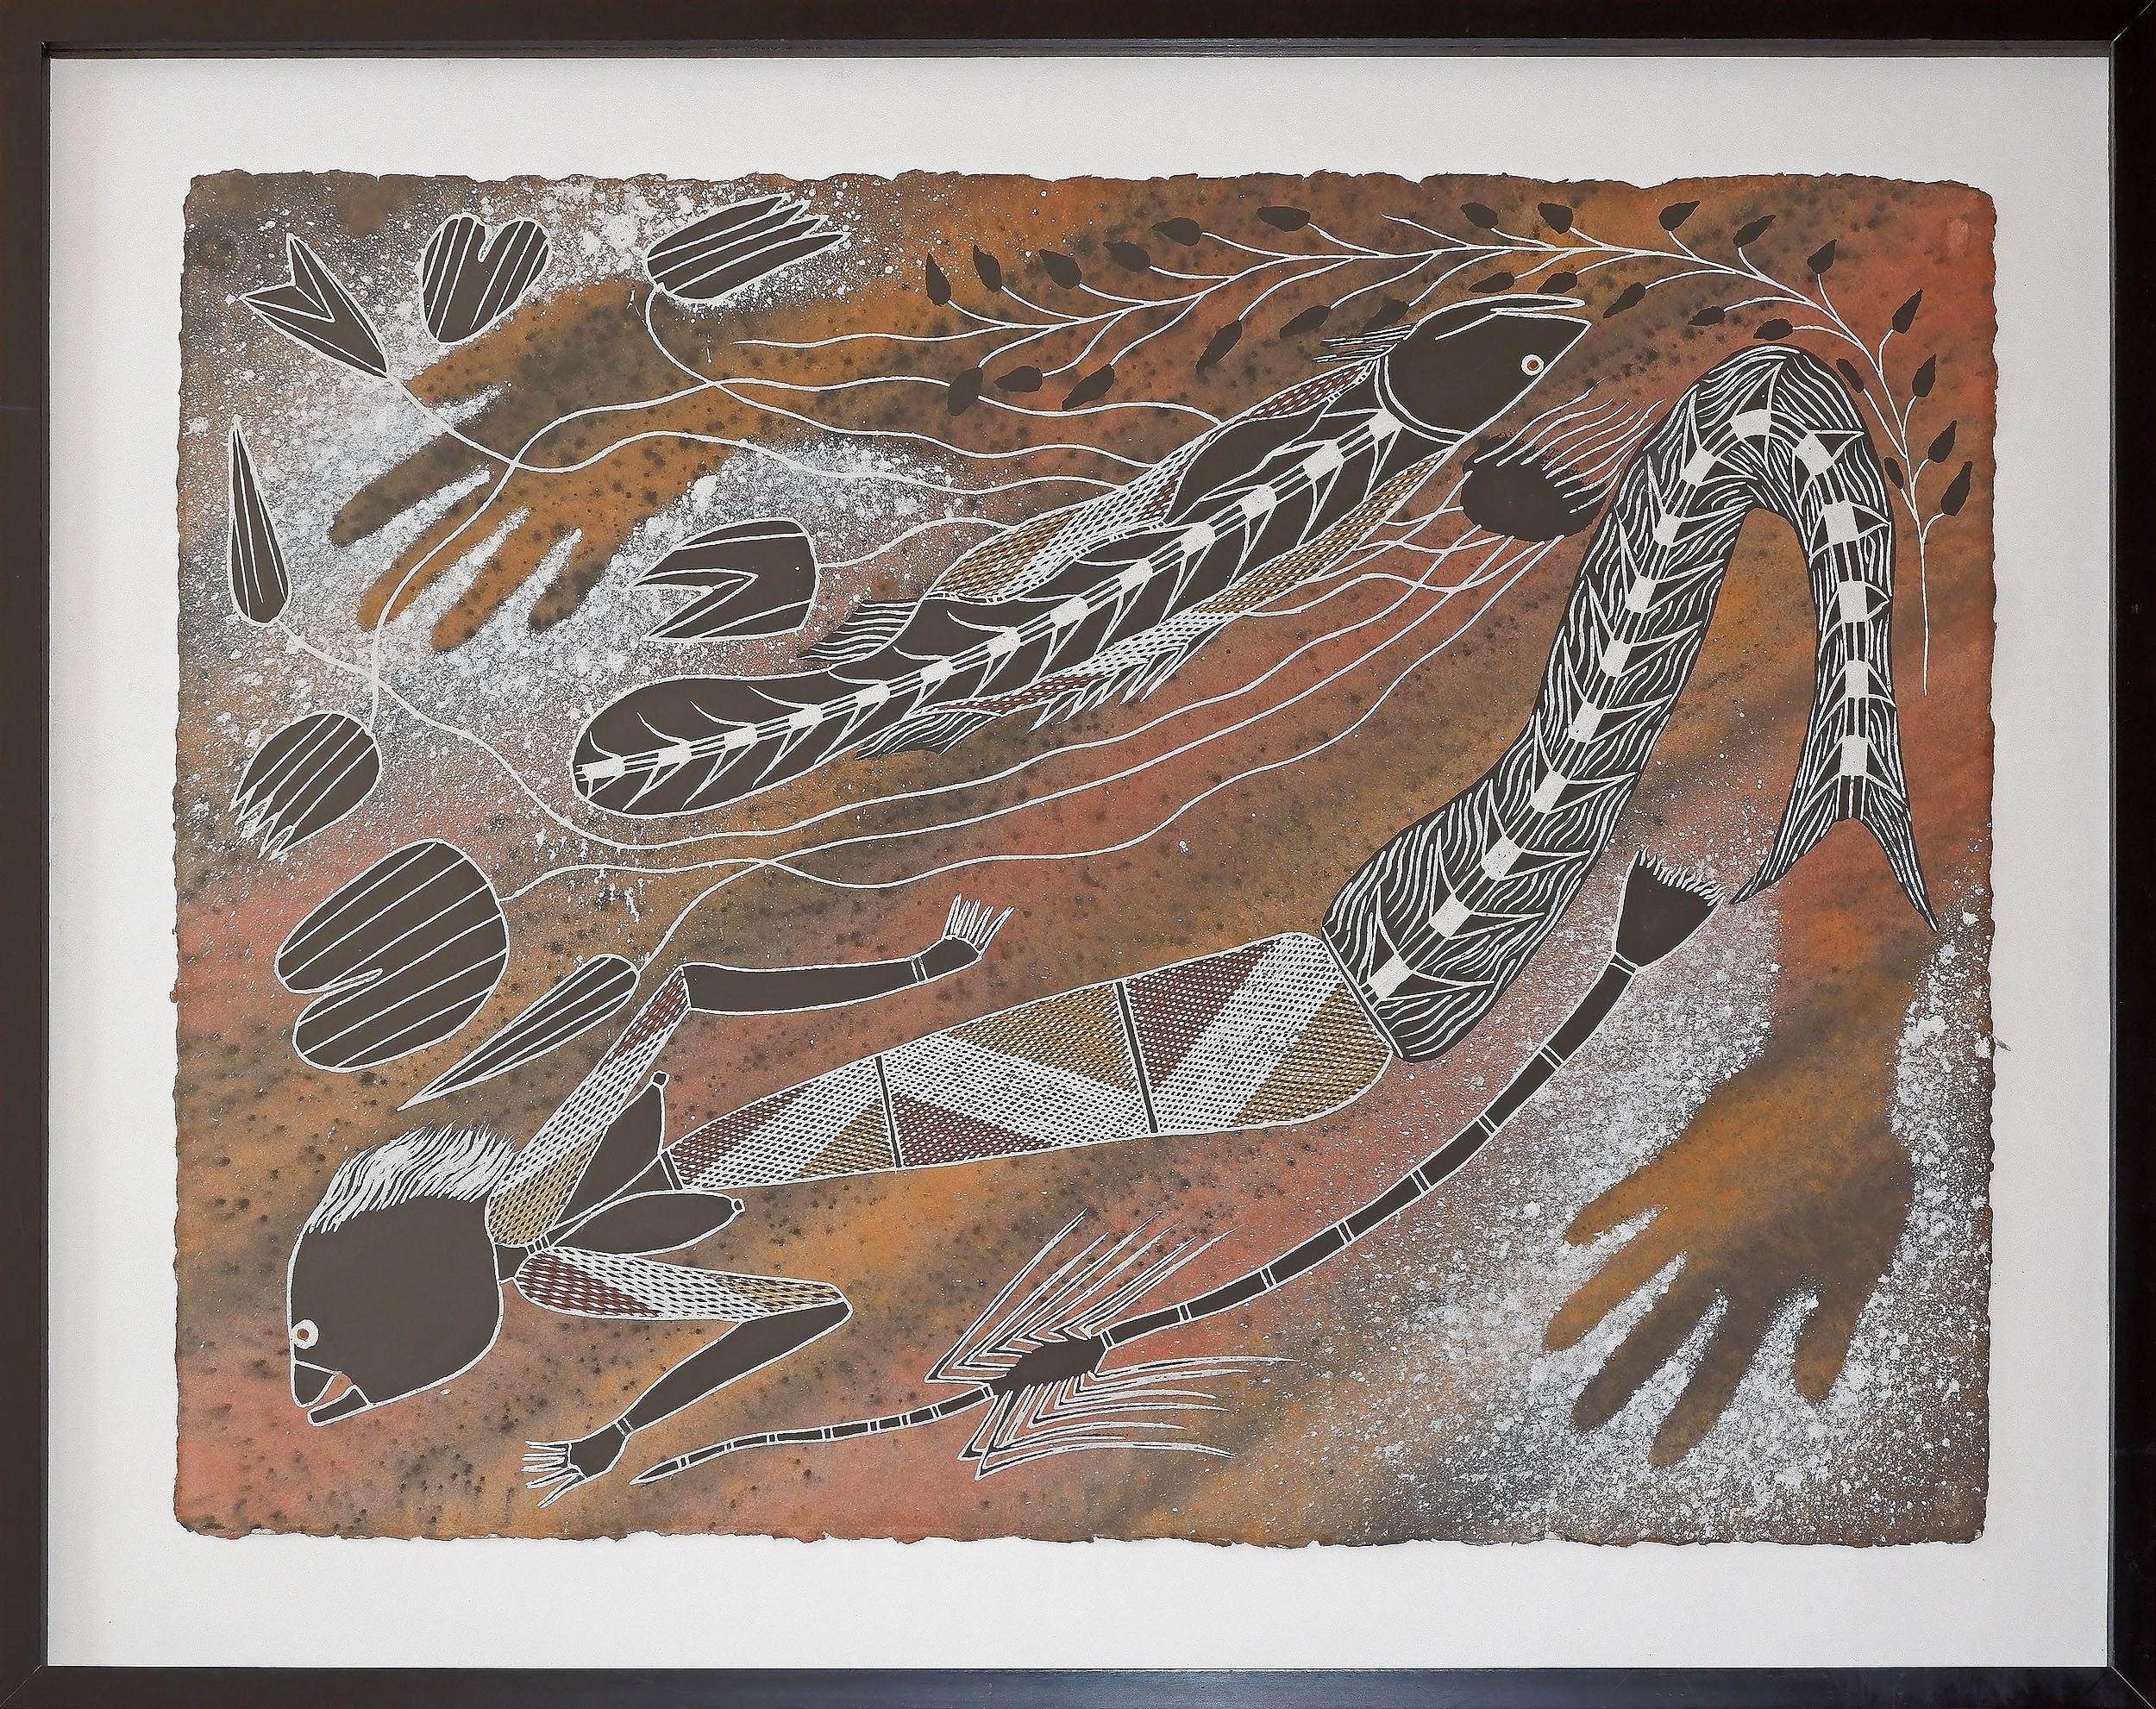 'Alex Nganjmirra (1961-2007, Kunwinjku language group) Female Water Spirits, Natural Earth Pigments on Arches Paper'